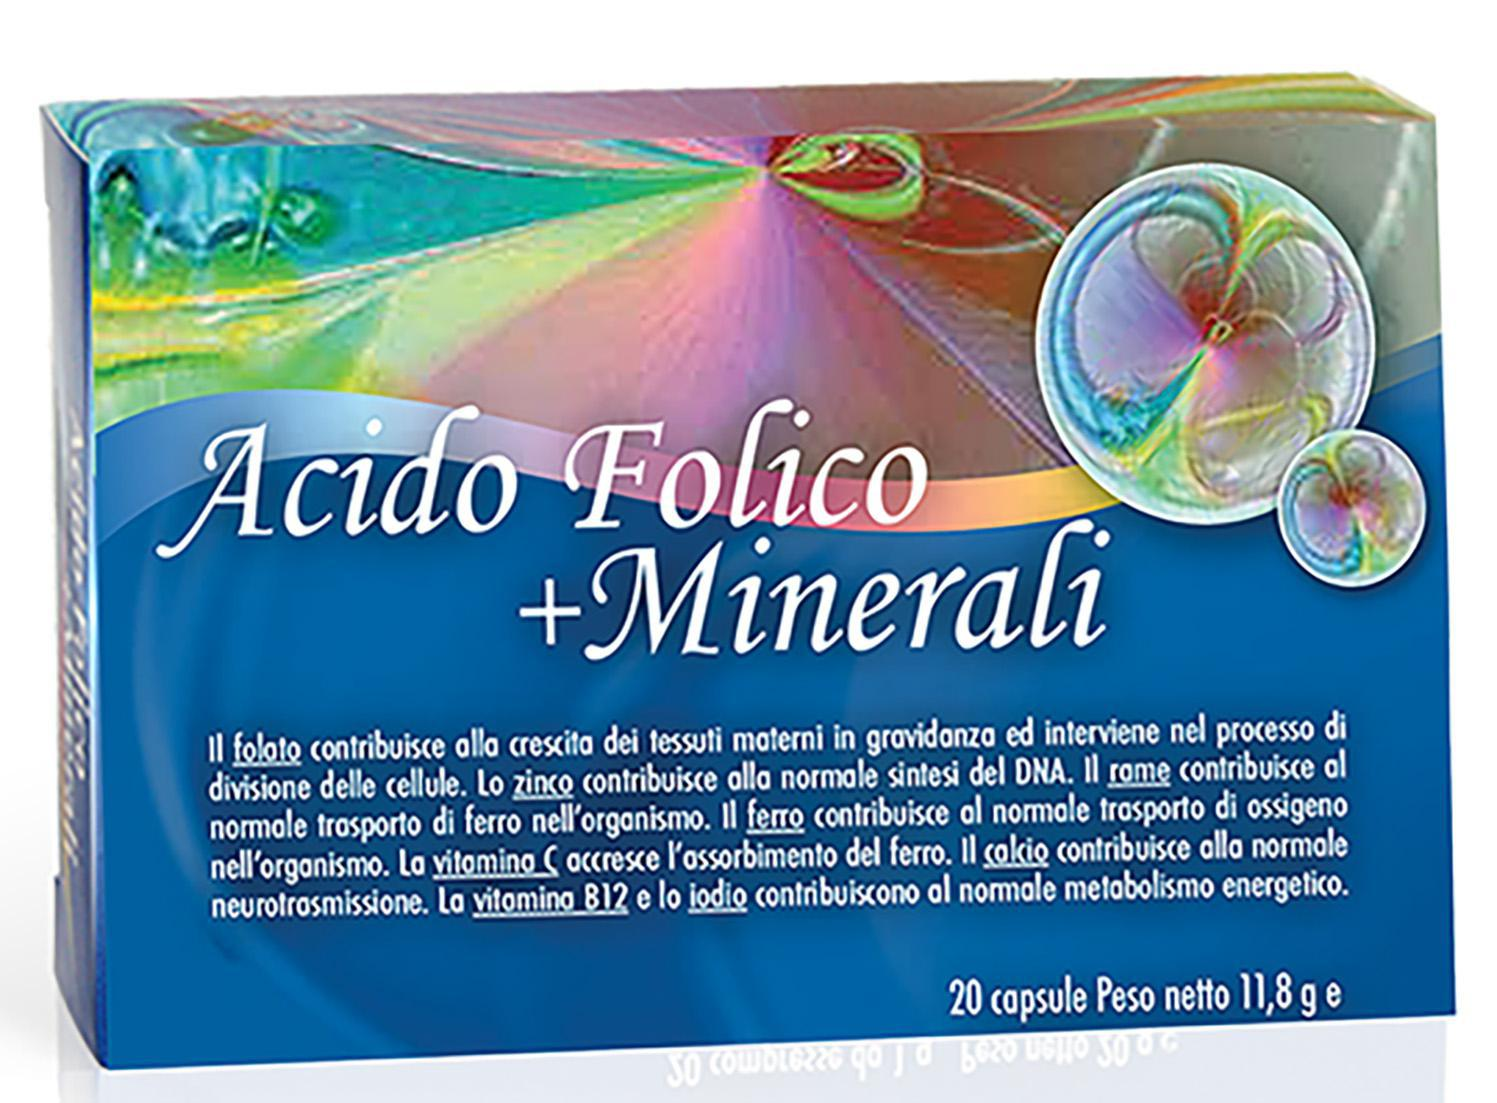 Acido Folico + Minerali